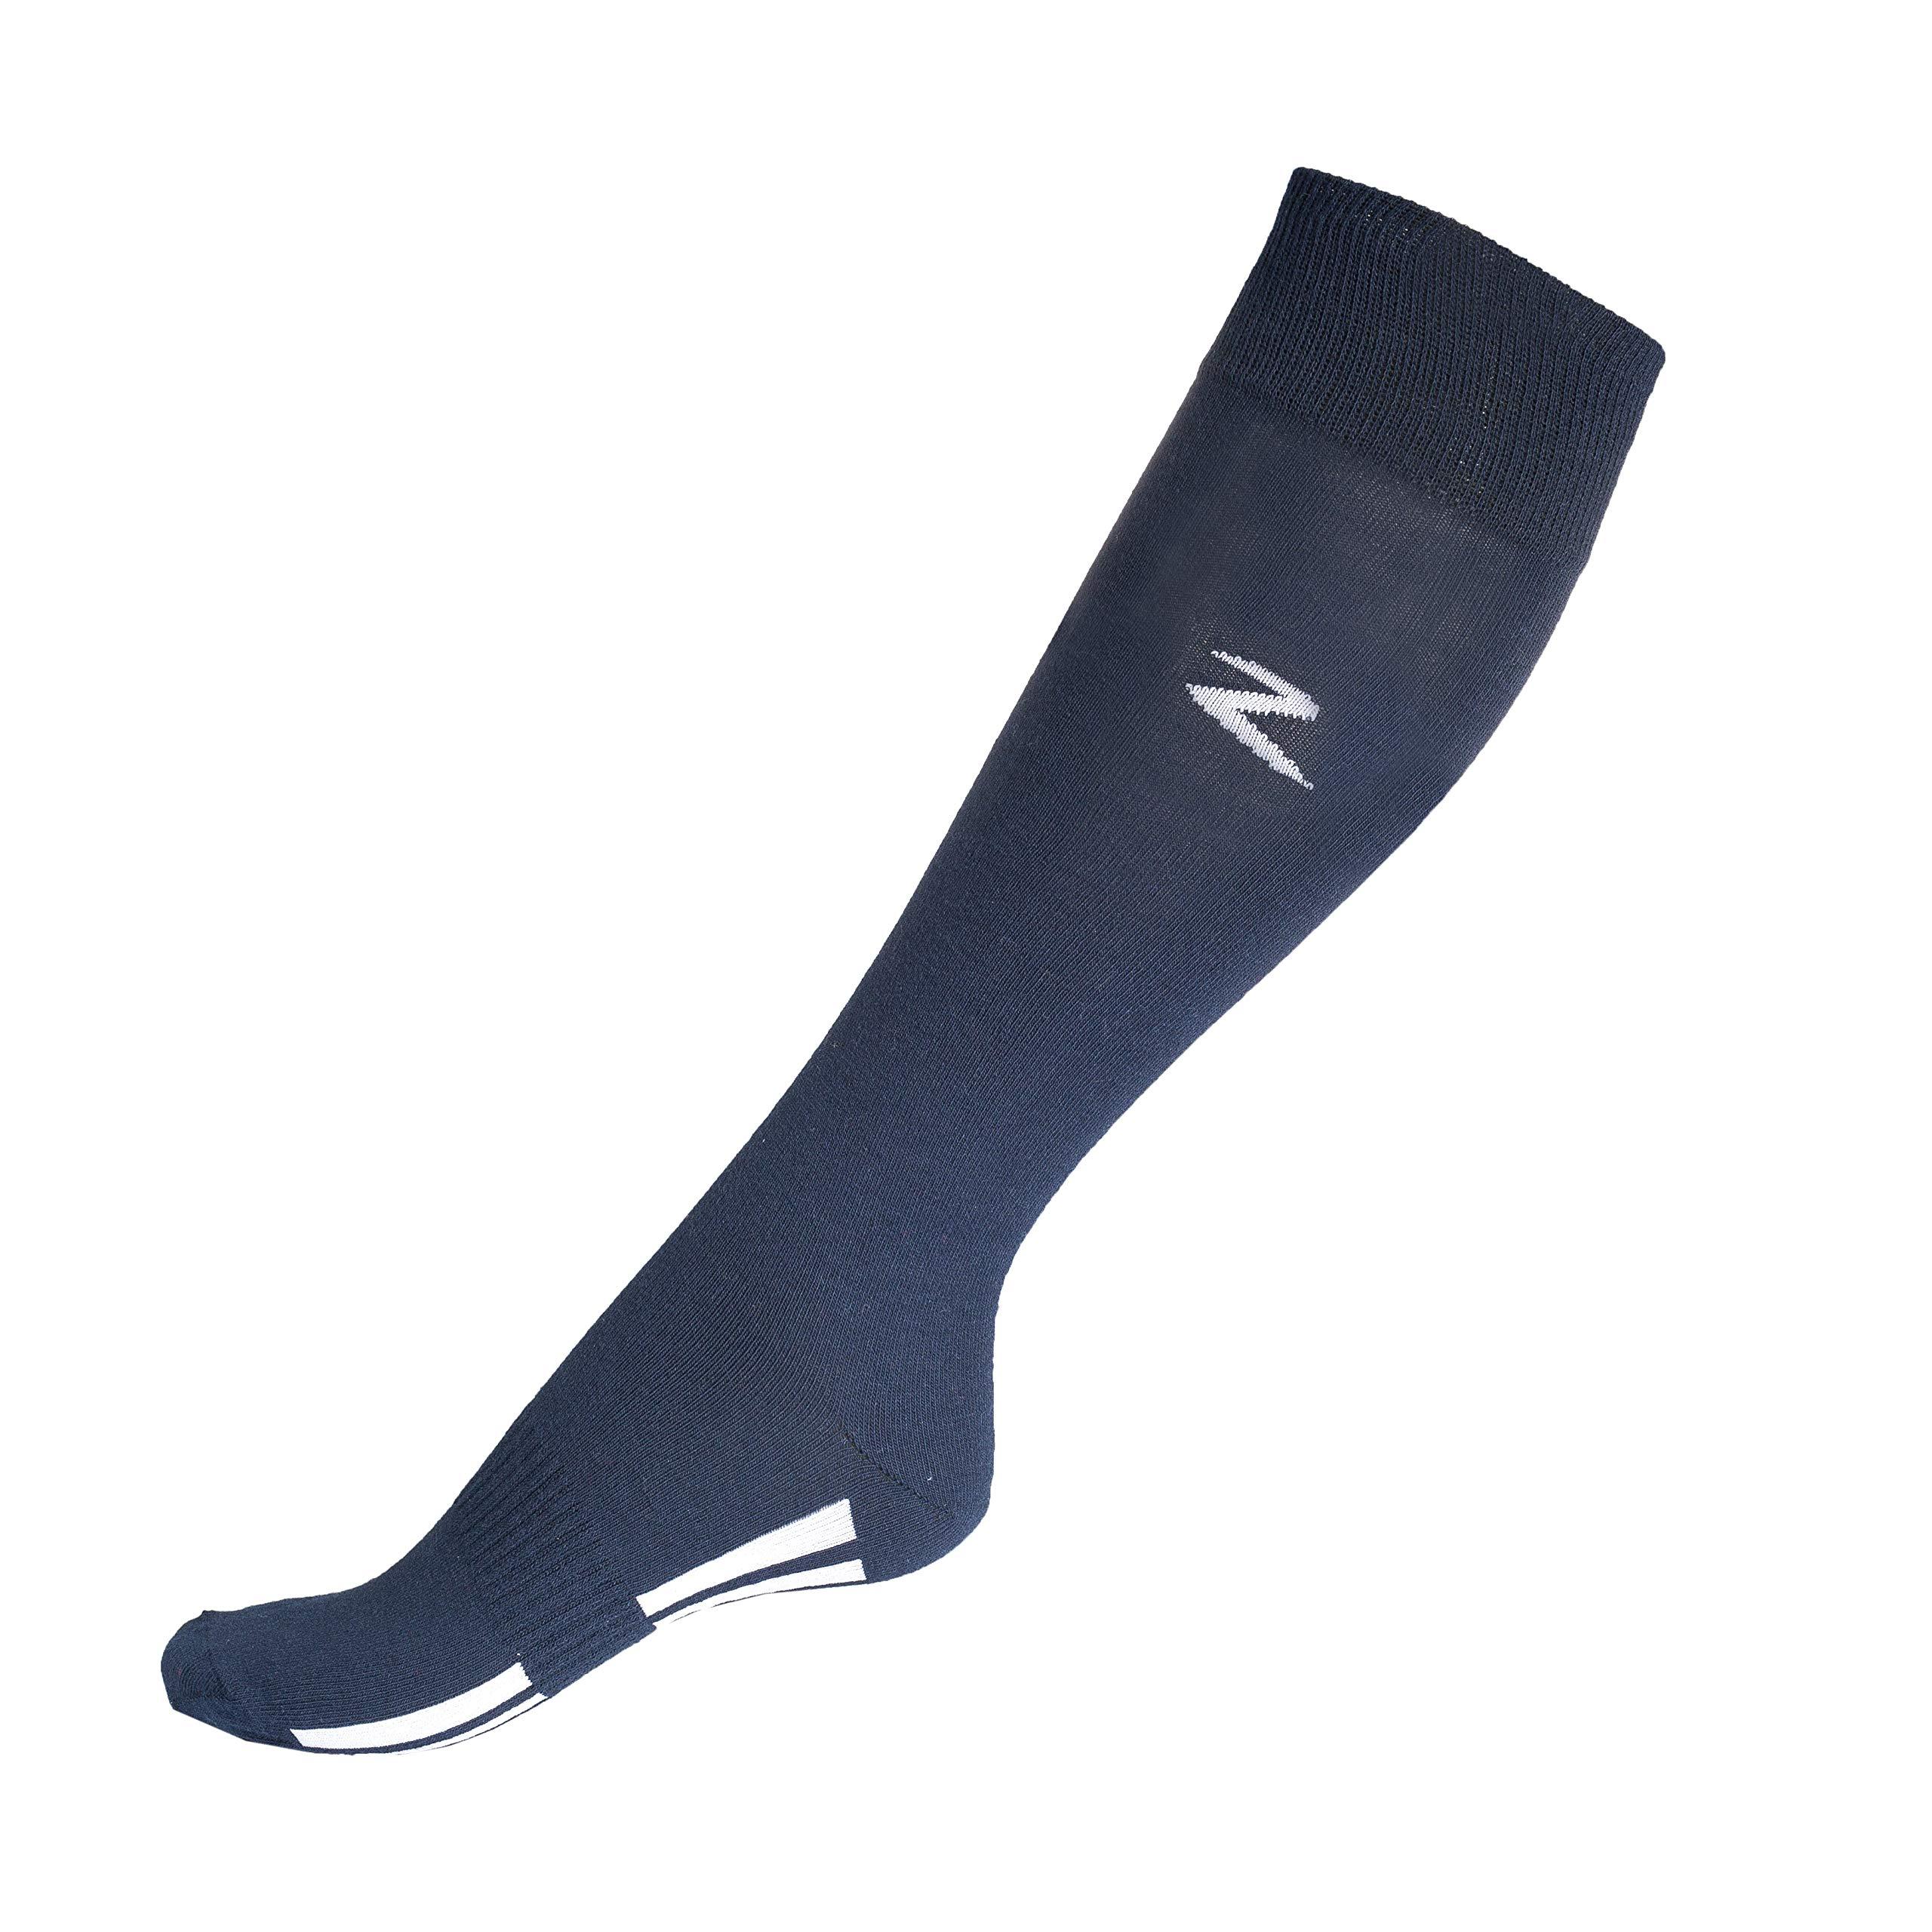 Horze Soft Comfort Coolmax High Knee Socks Peacoat Dark Blue 8.5-10